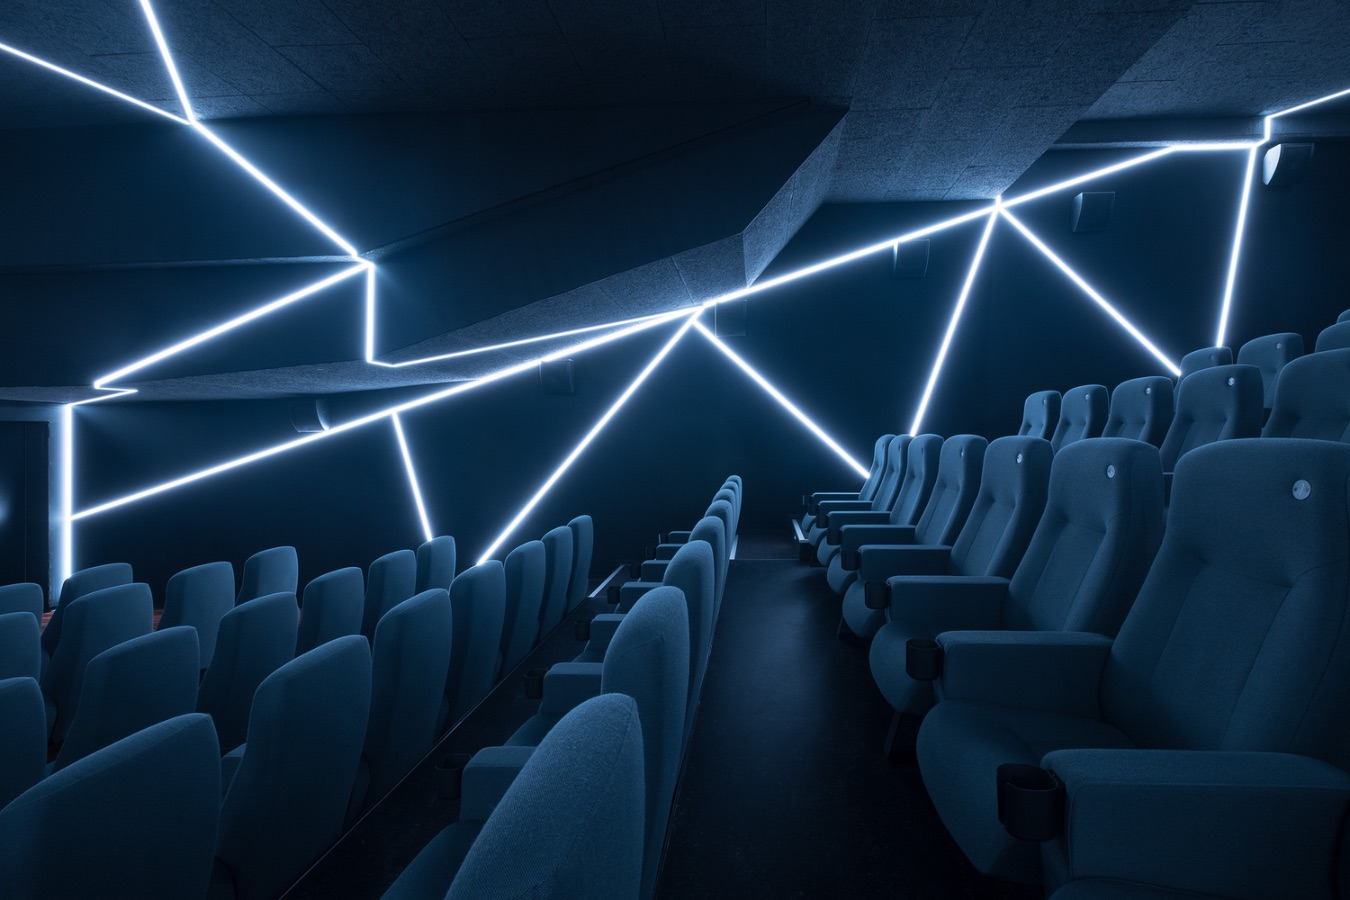 4_Delphi LUX Cinema_Batek Architekten+Ester Bruzkus Architekten_Inspirationist